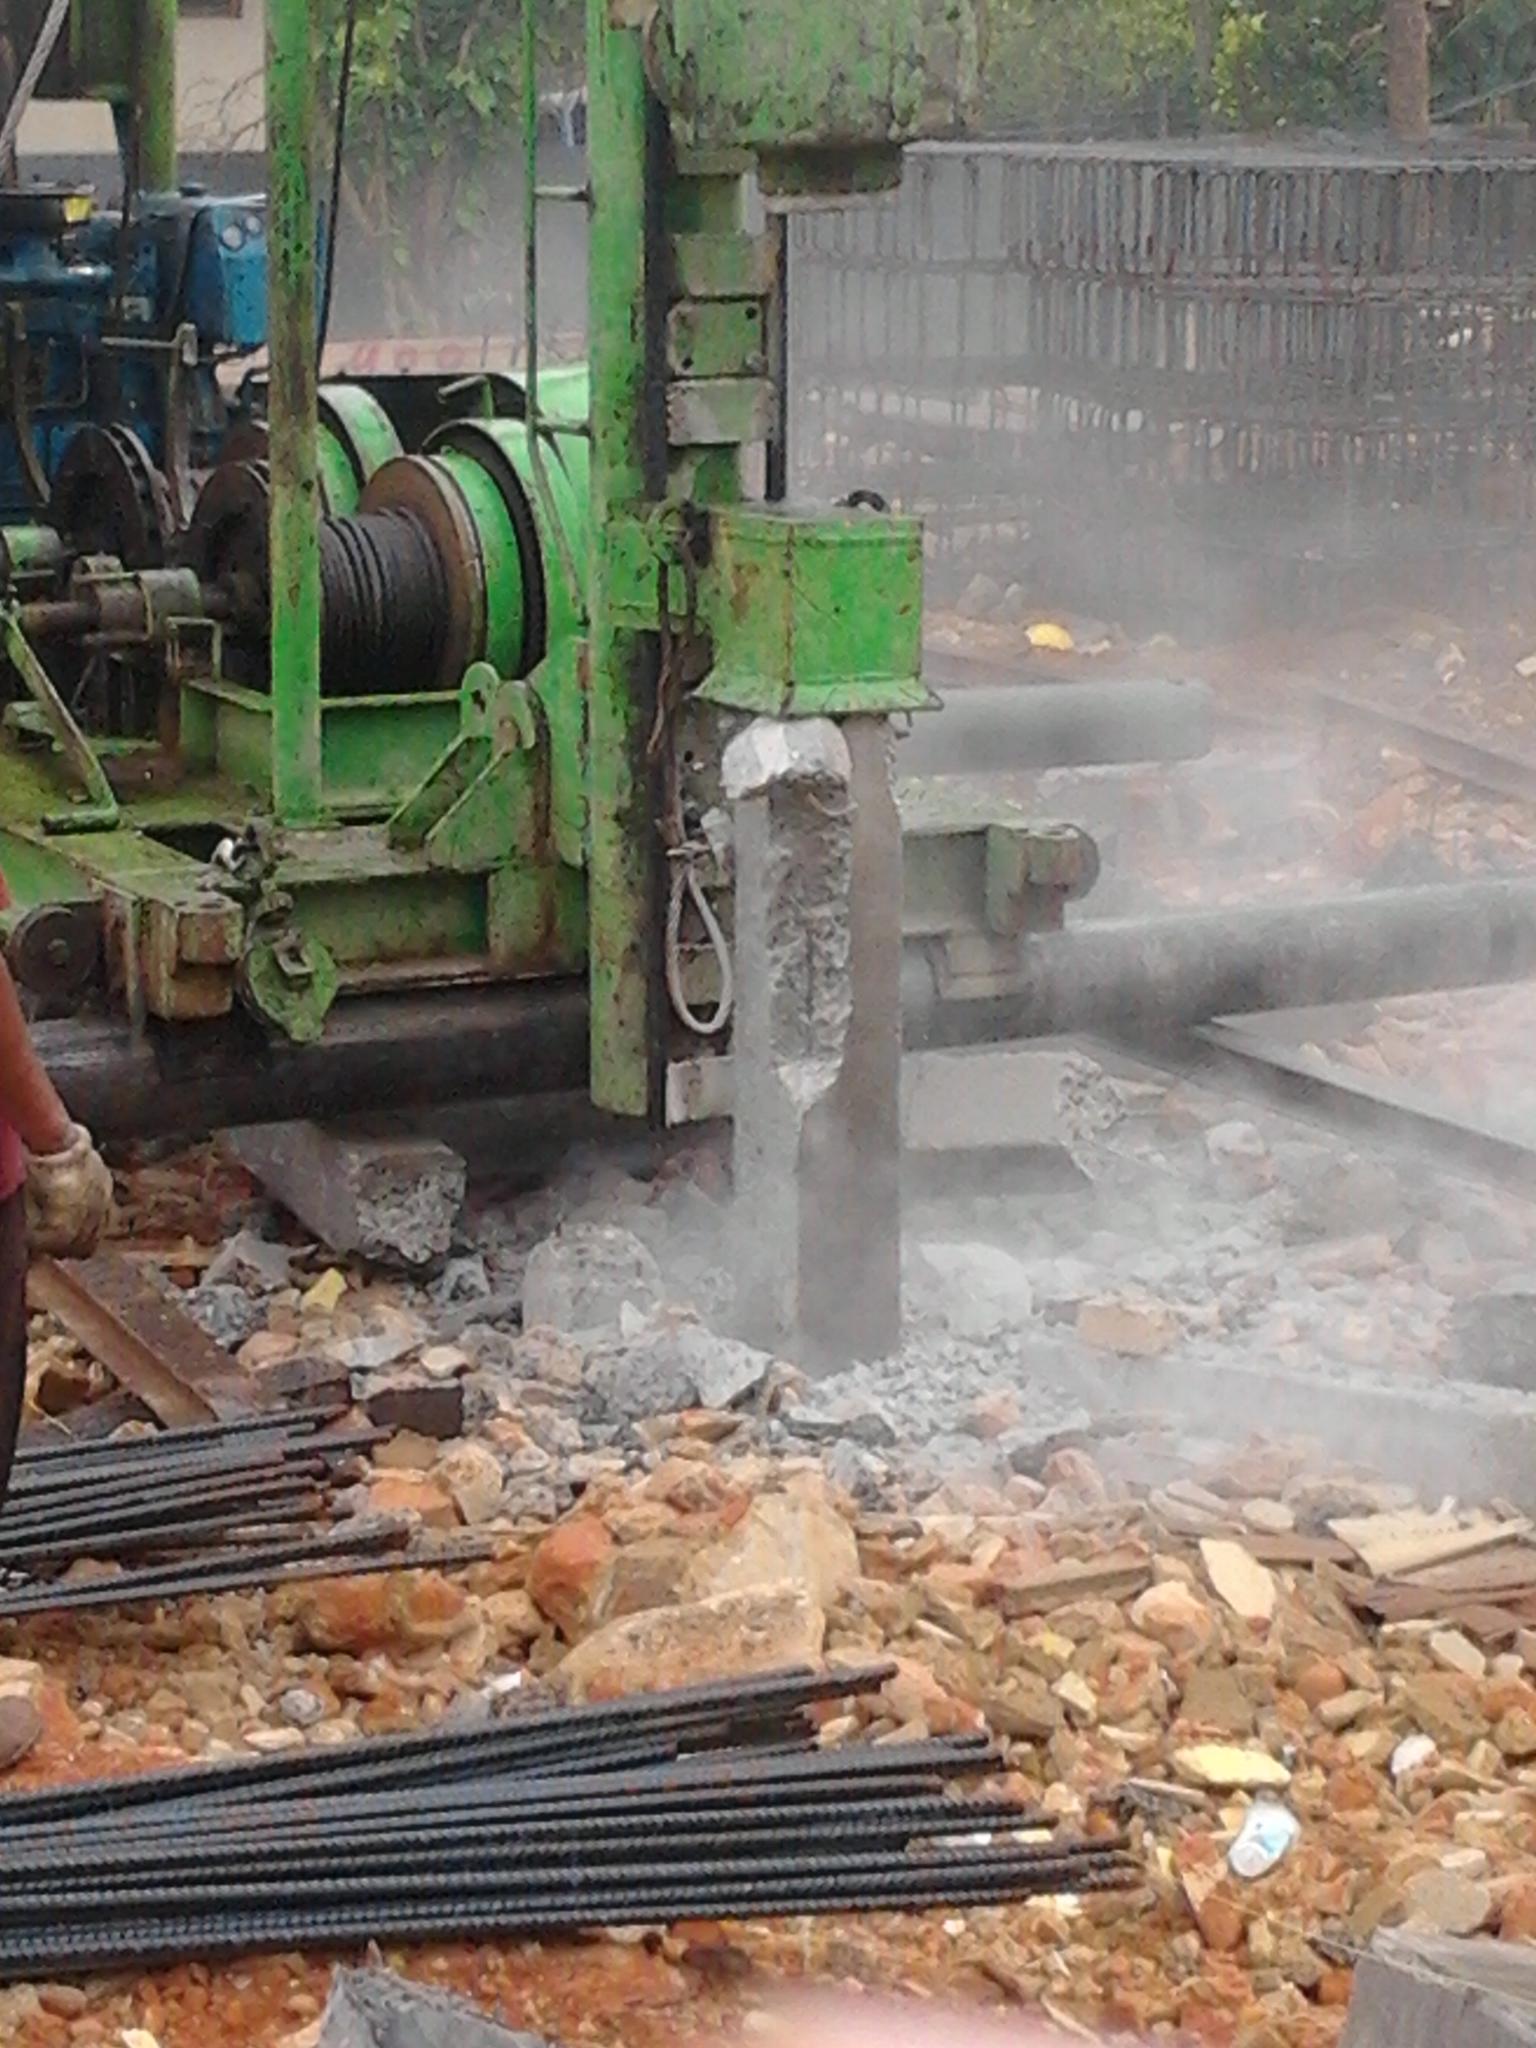 On construction, Build, Construction, Drop, Hammer, HQ Photo